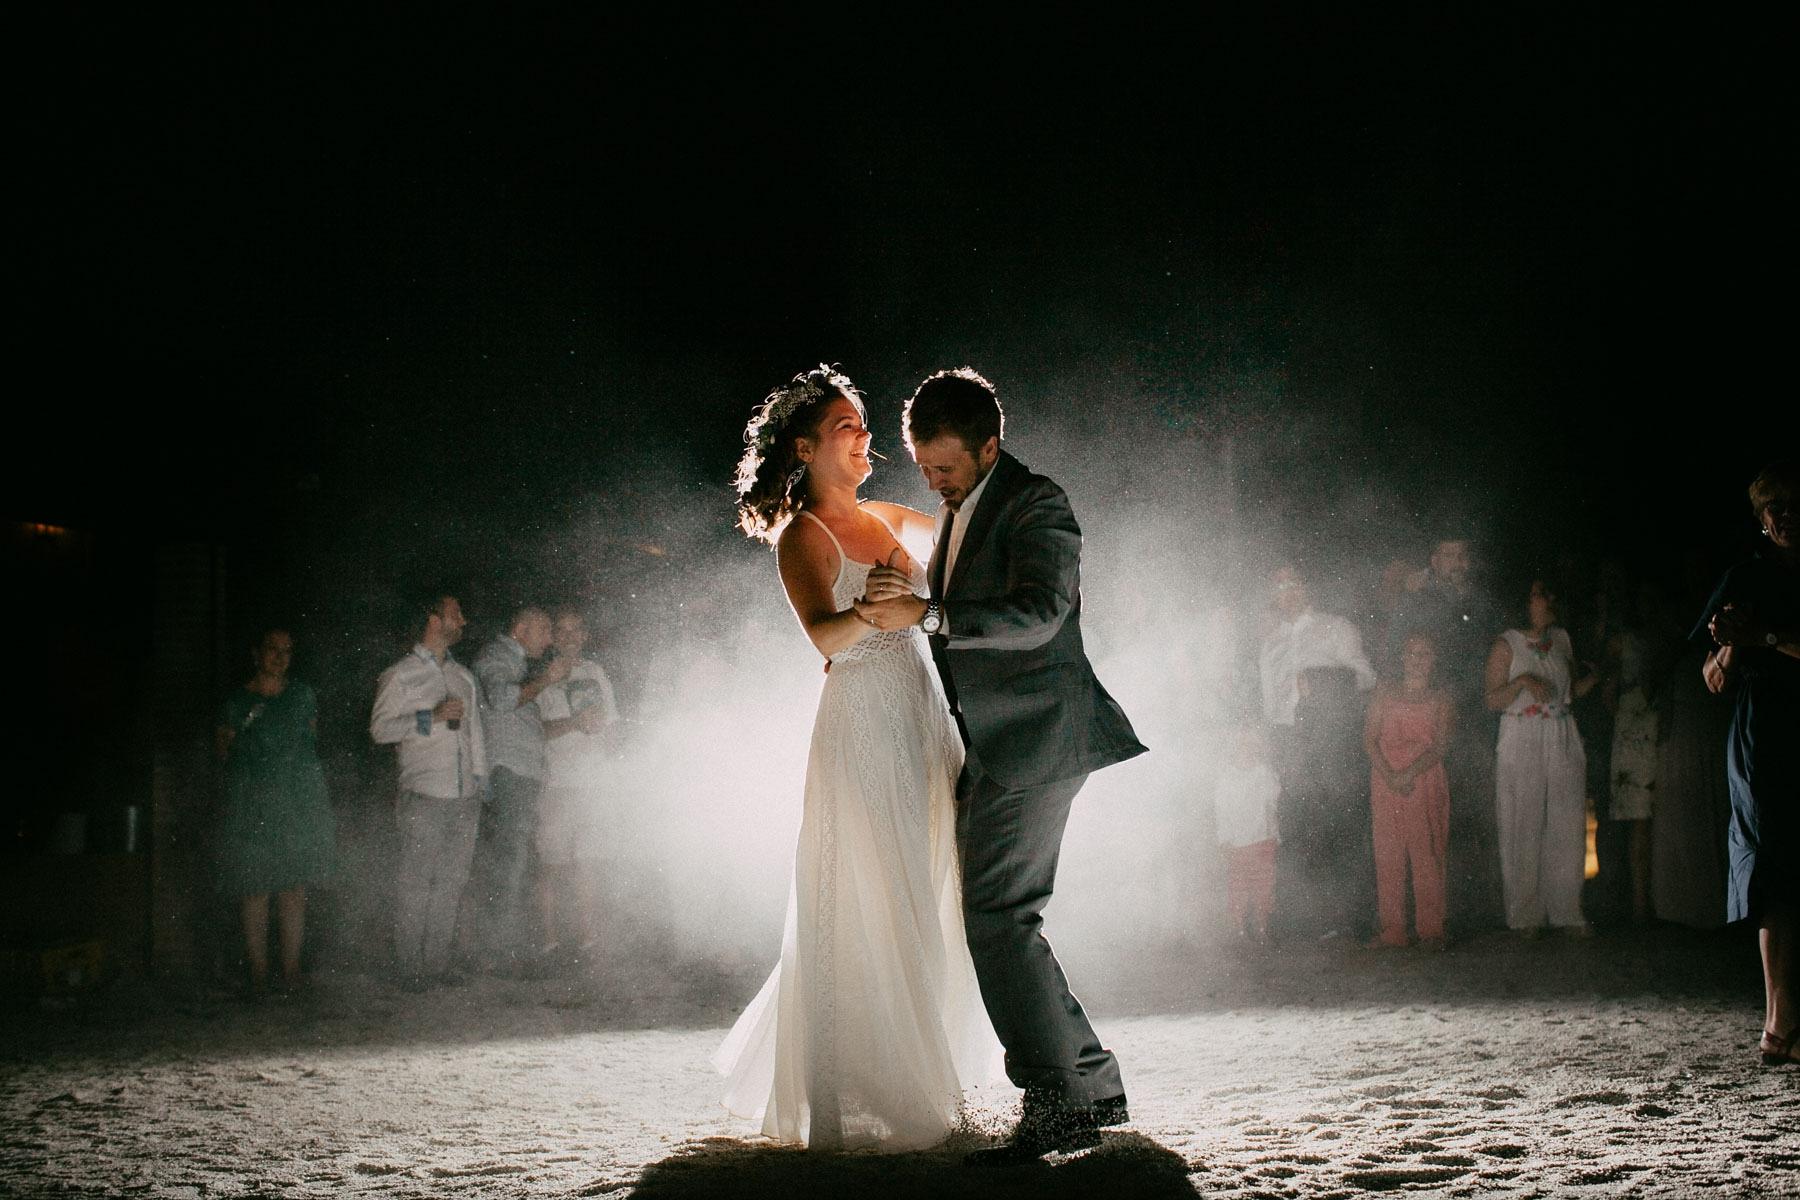 fotografo de bodas Jairo Crena-139